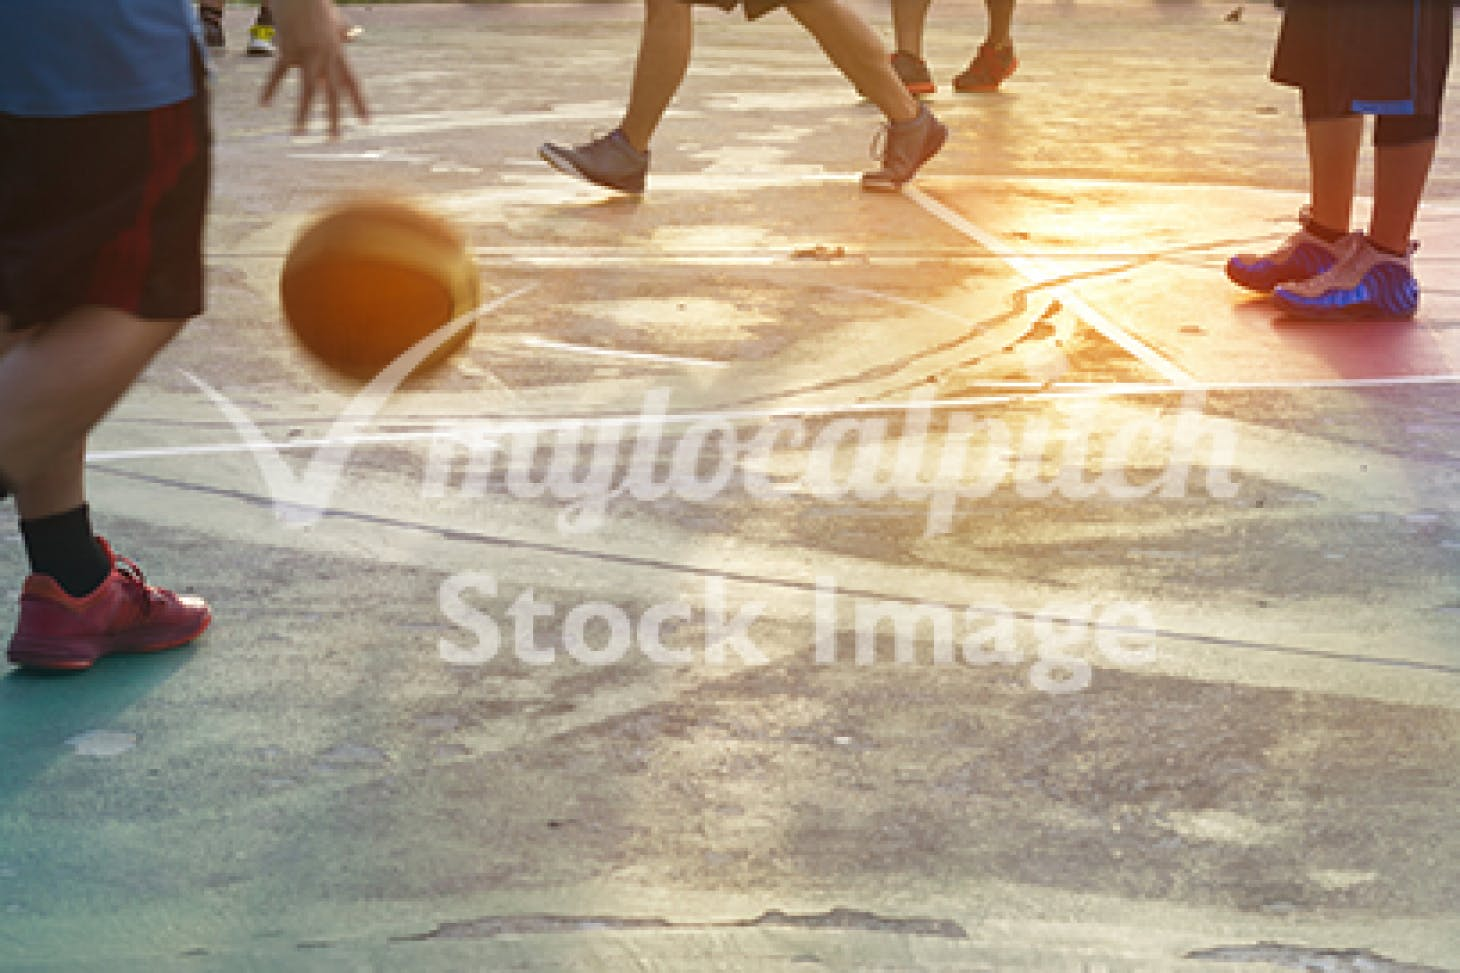 Desborough College Indoor basketball court